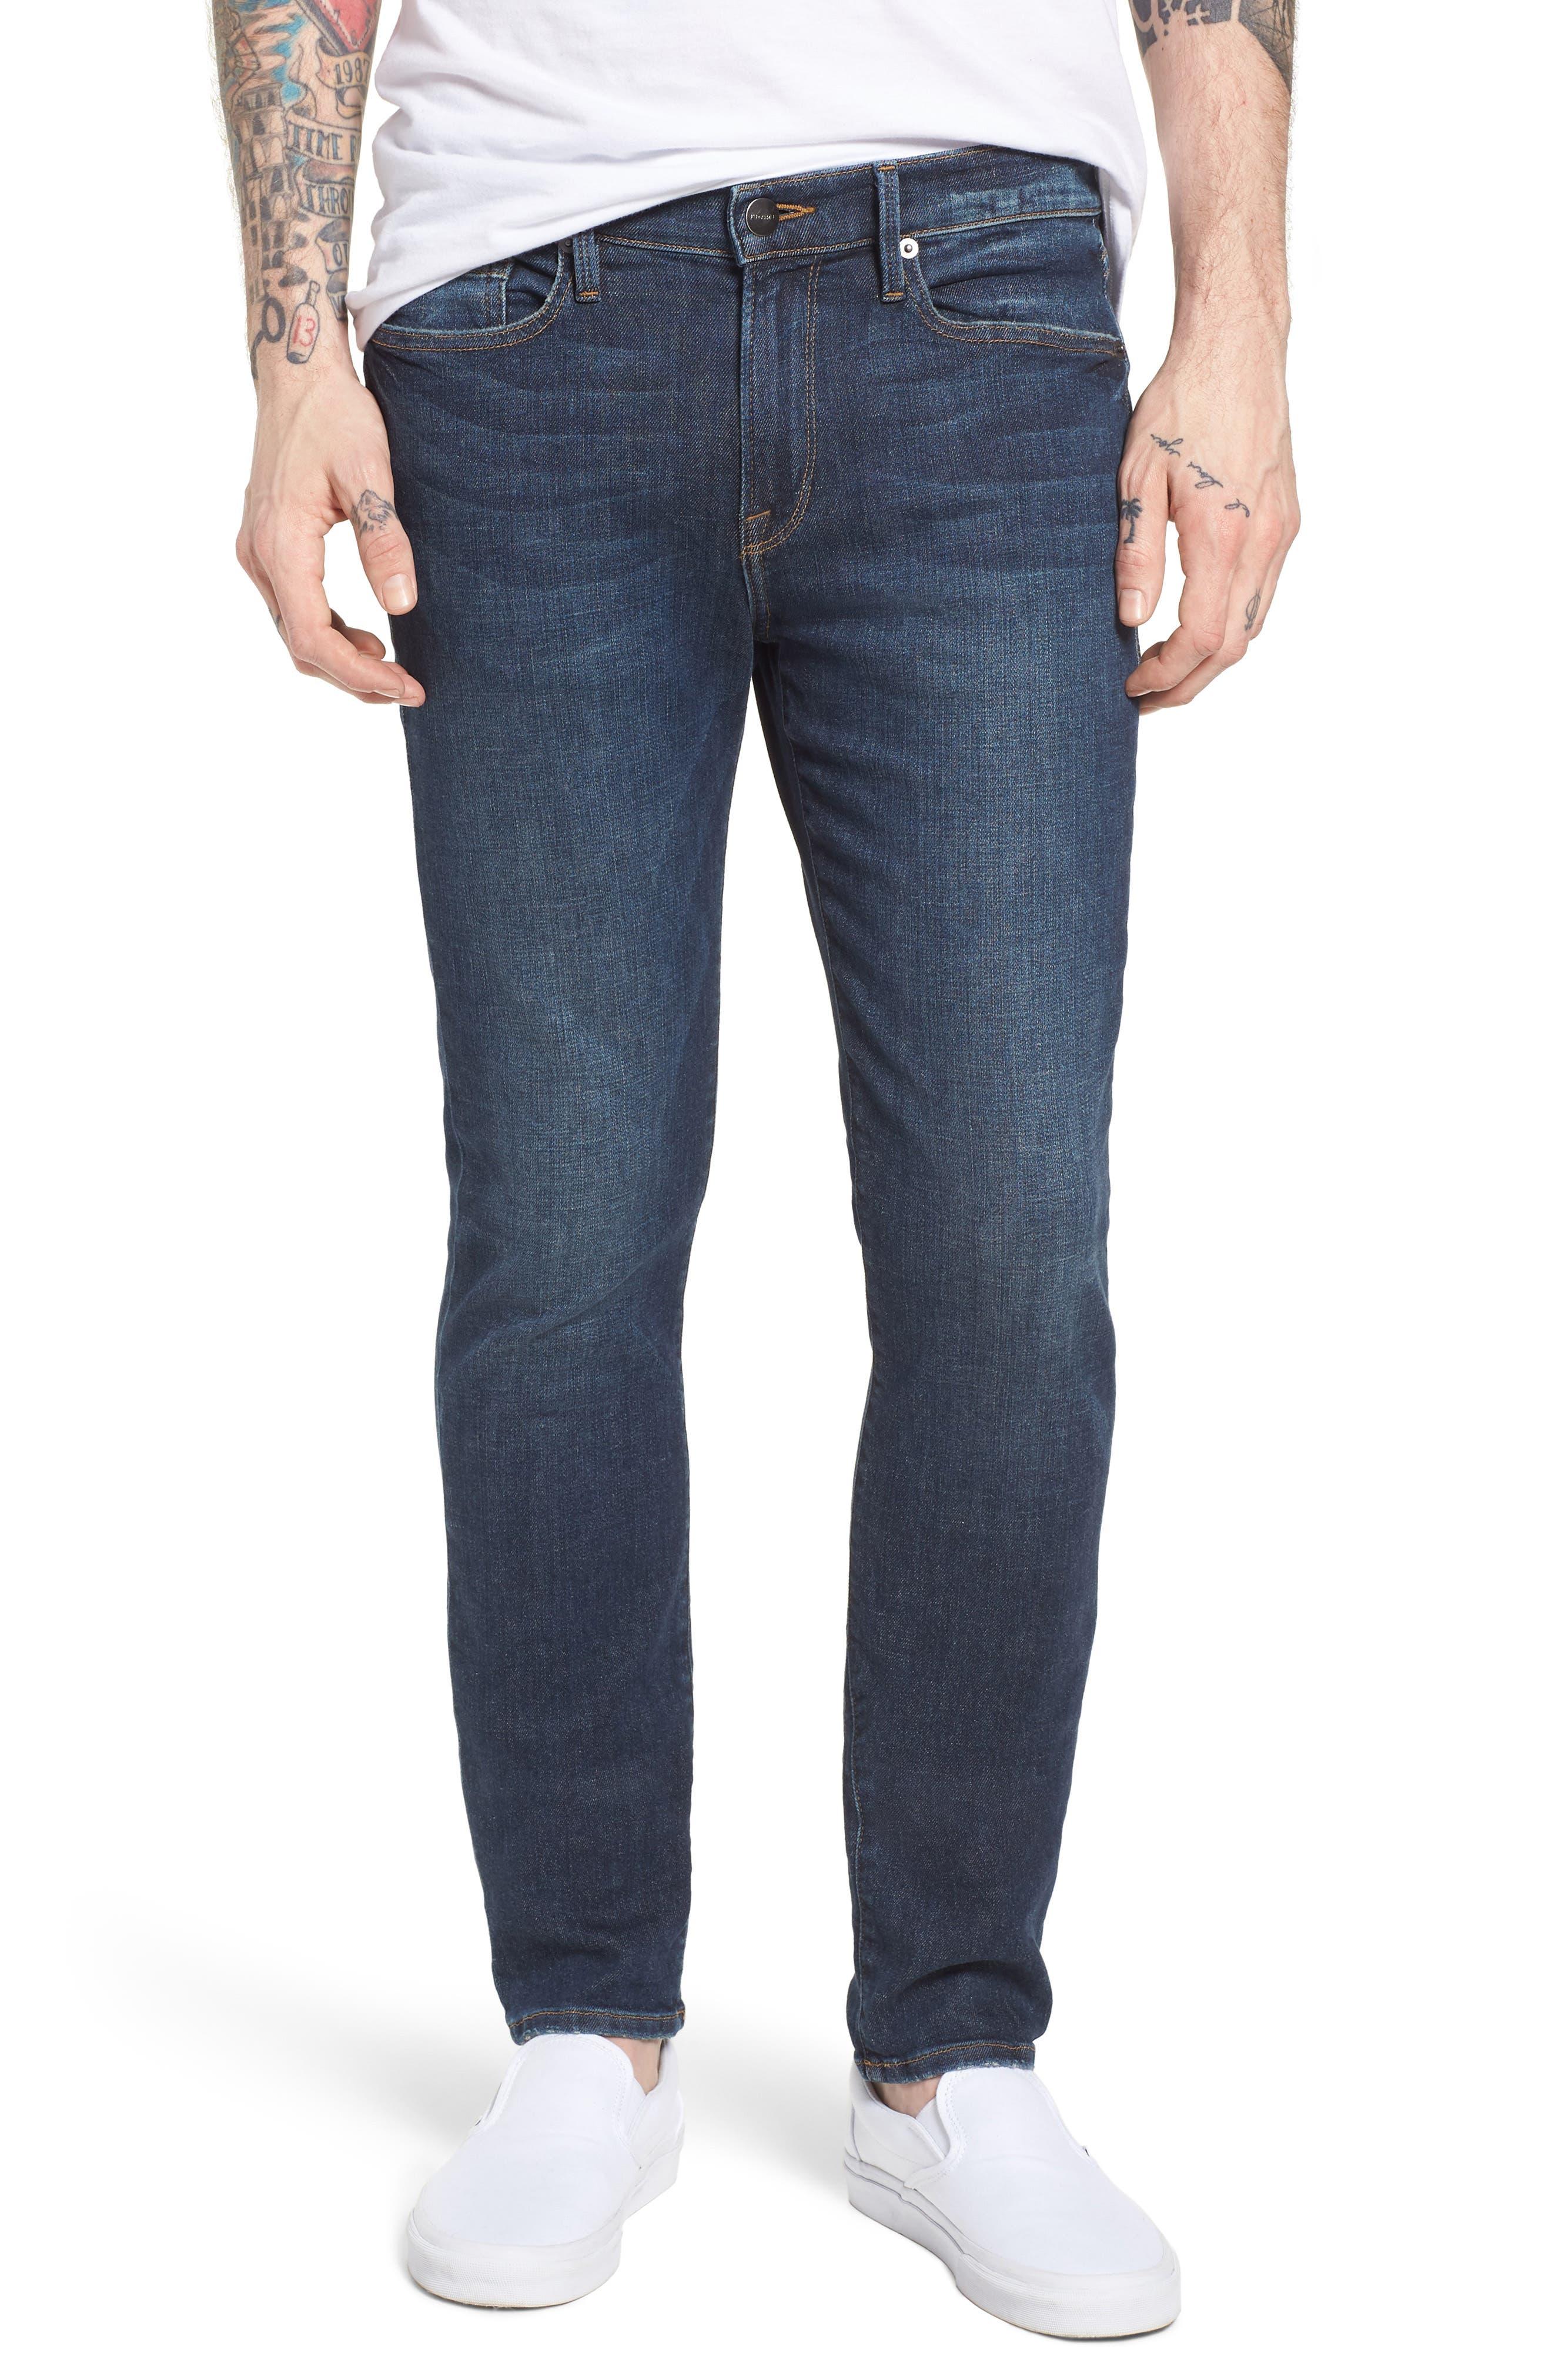 L'Homme Skinny Jeans,                         Main,                         color, Loris